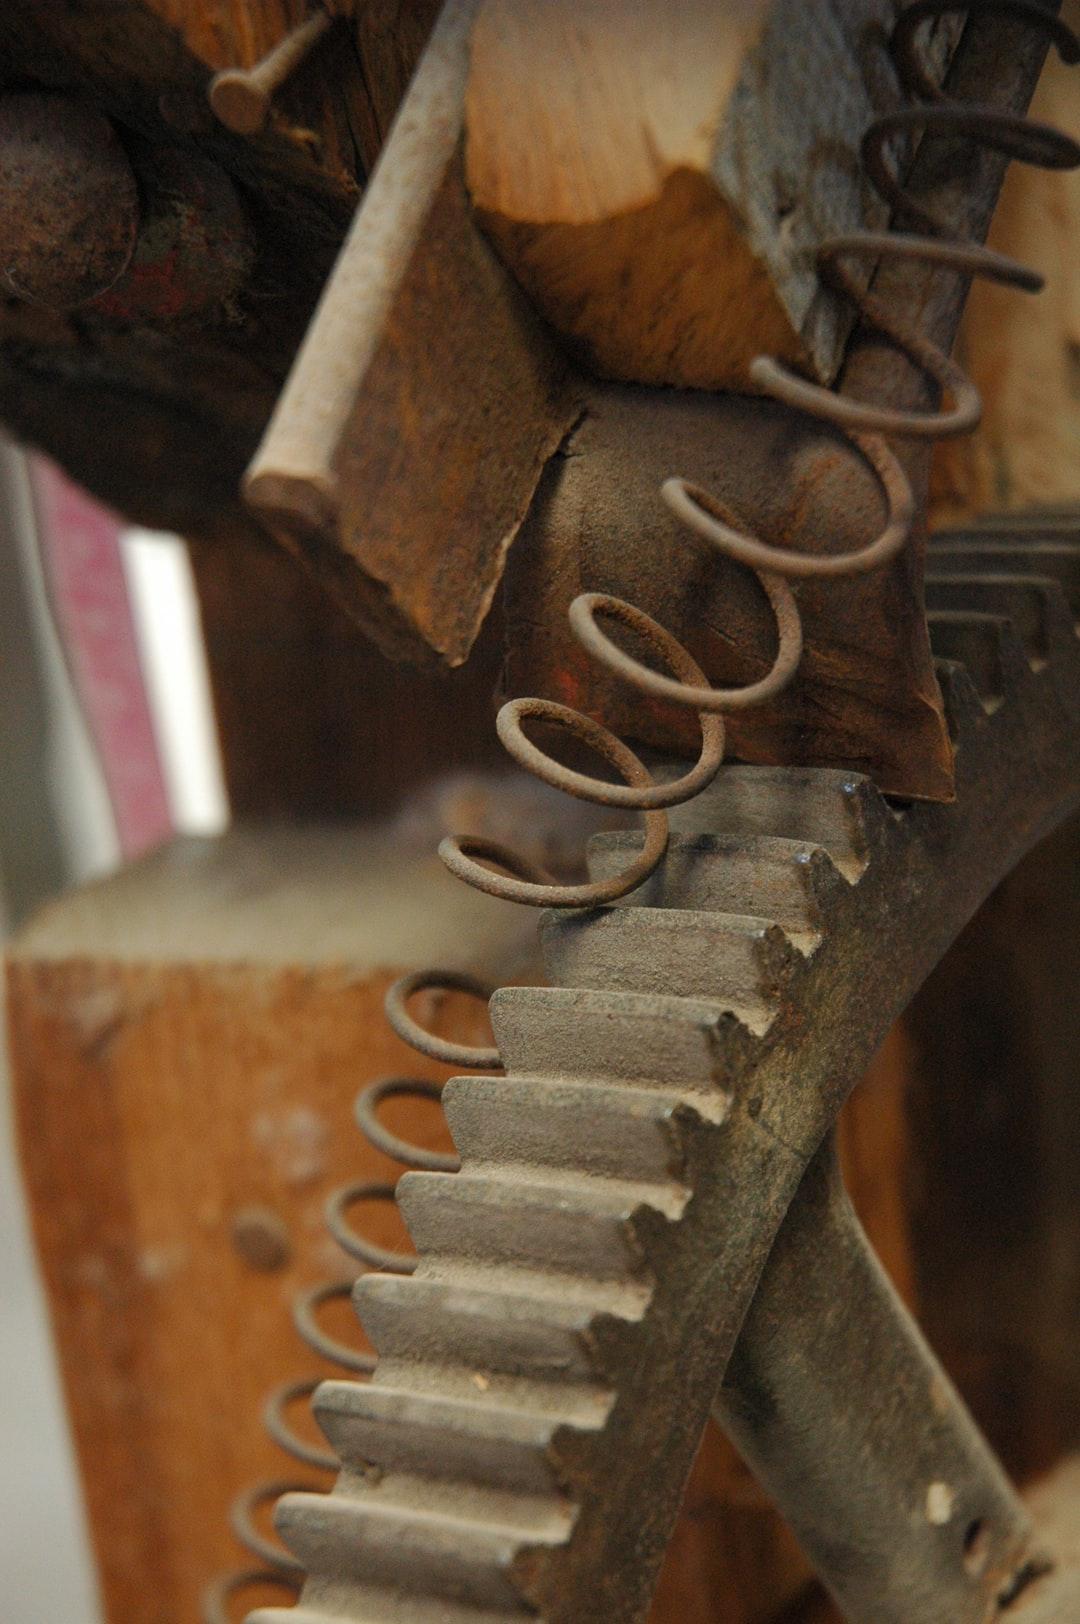 Spring, cog, metal, nail, wood, boards, governor, Artesania Cuauhtemoc, Weaver, Barrio Manglito, 23060 La Paz, B.C.S., Mexico